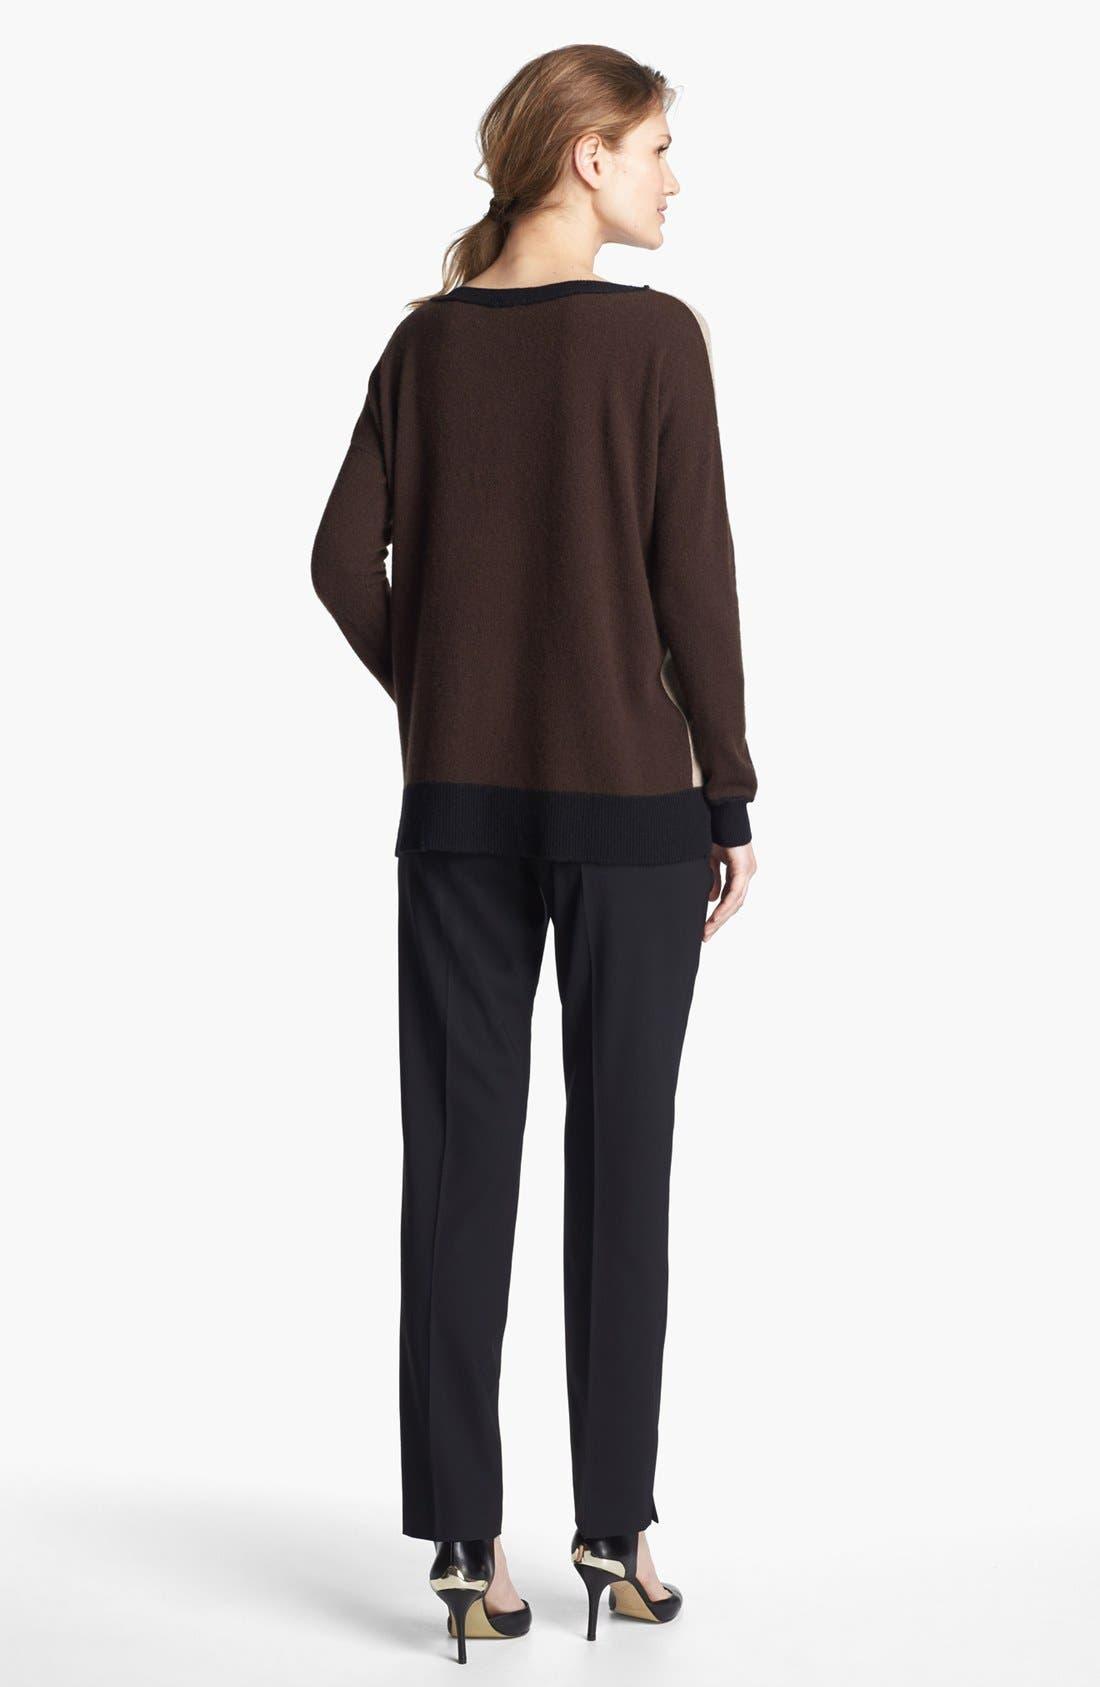 Colorblock Oversized Cashmere Sweater,                             Alternate thumbnail 4, color,                             Sand Multi